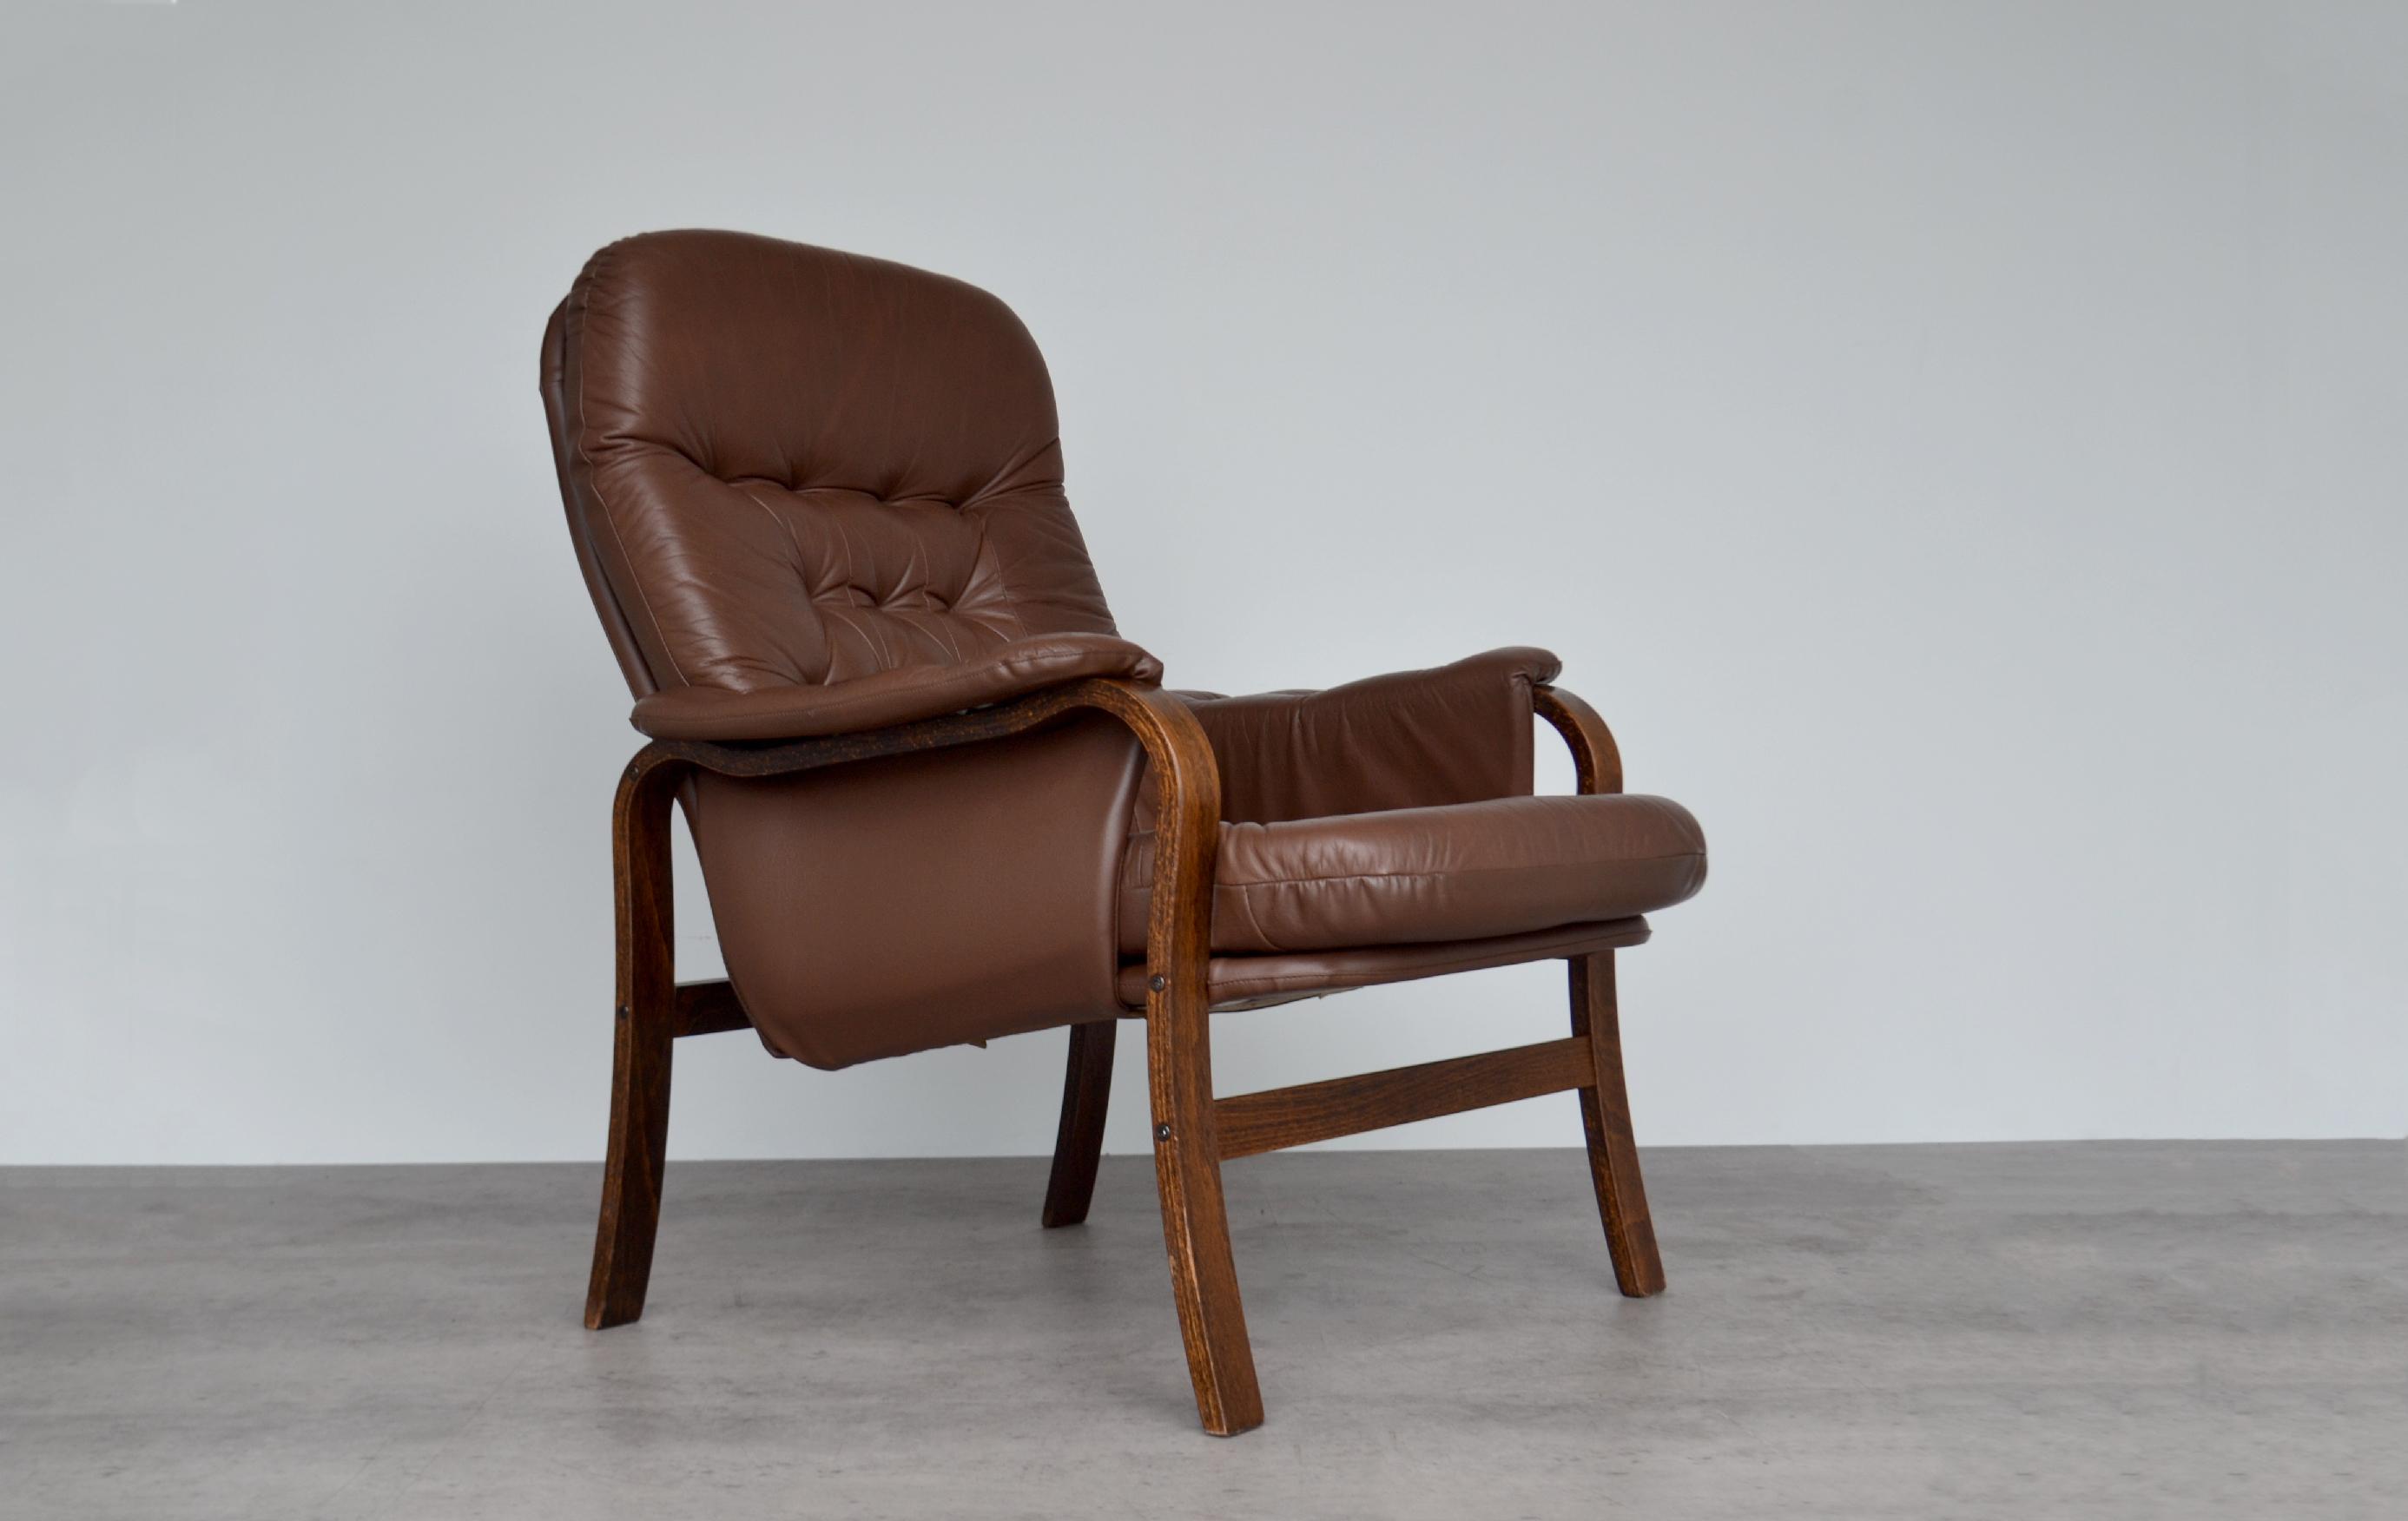 Image of: Vintage Mid Century Norwegian Rosewood And Leather Bentwood Armchair Chair Lounge Chair By Ingmar Relling For Westnofa Ingmar Relling Westnofa Vinterior